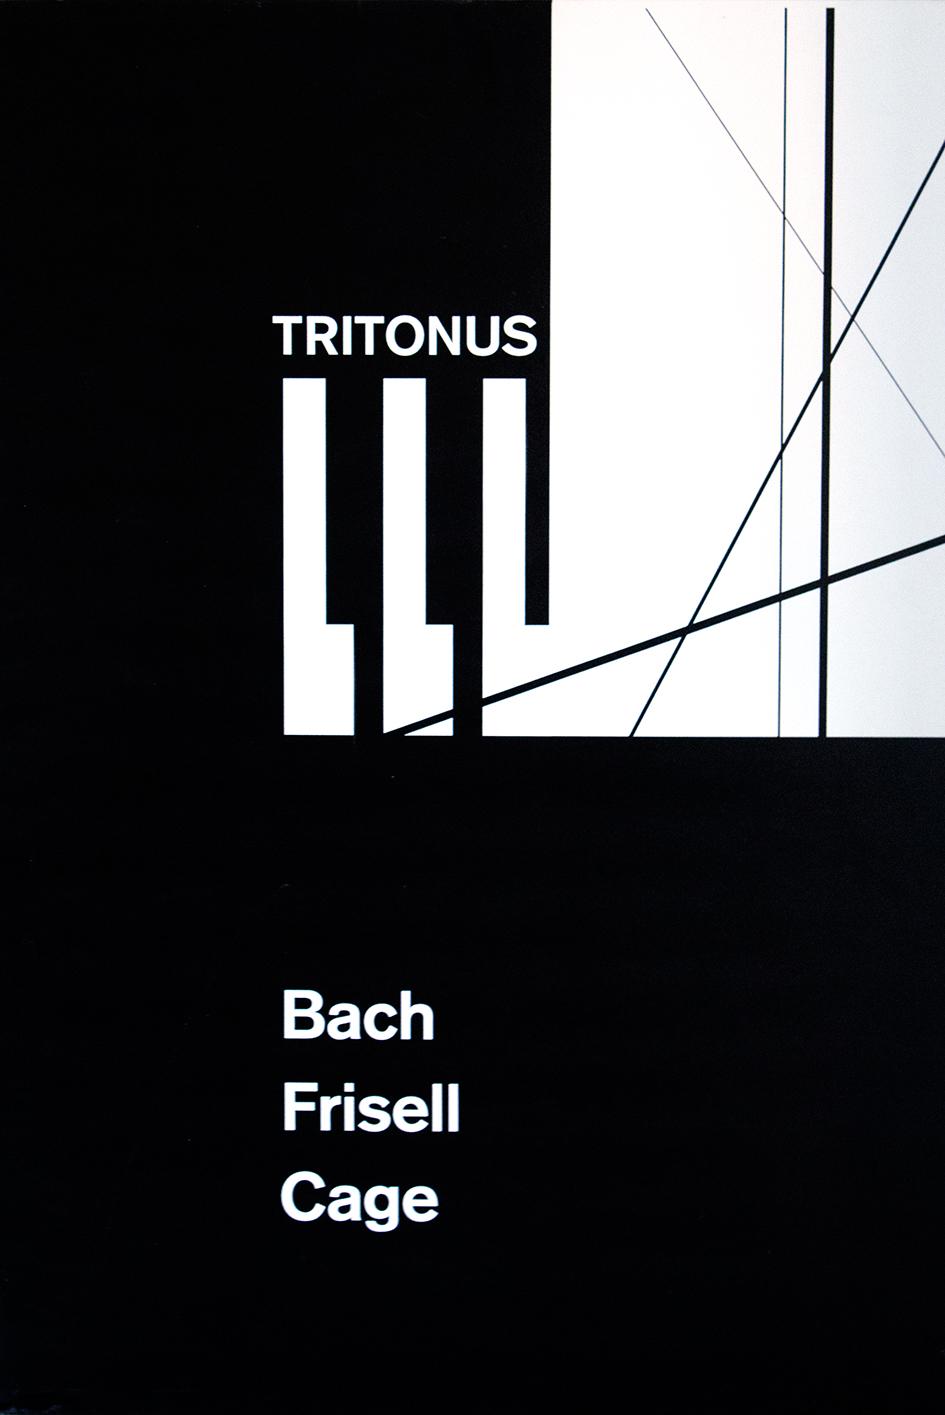 Plakatgestaltung Tritonus